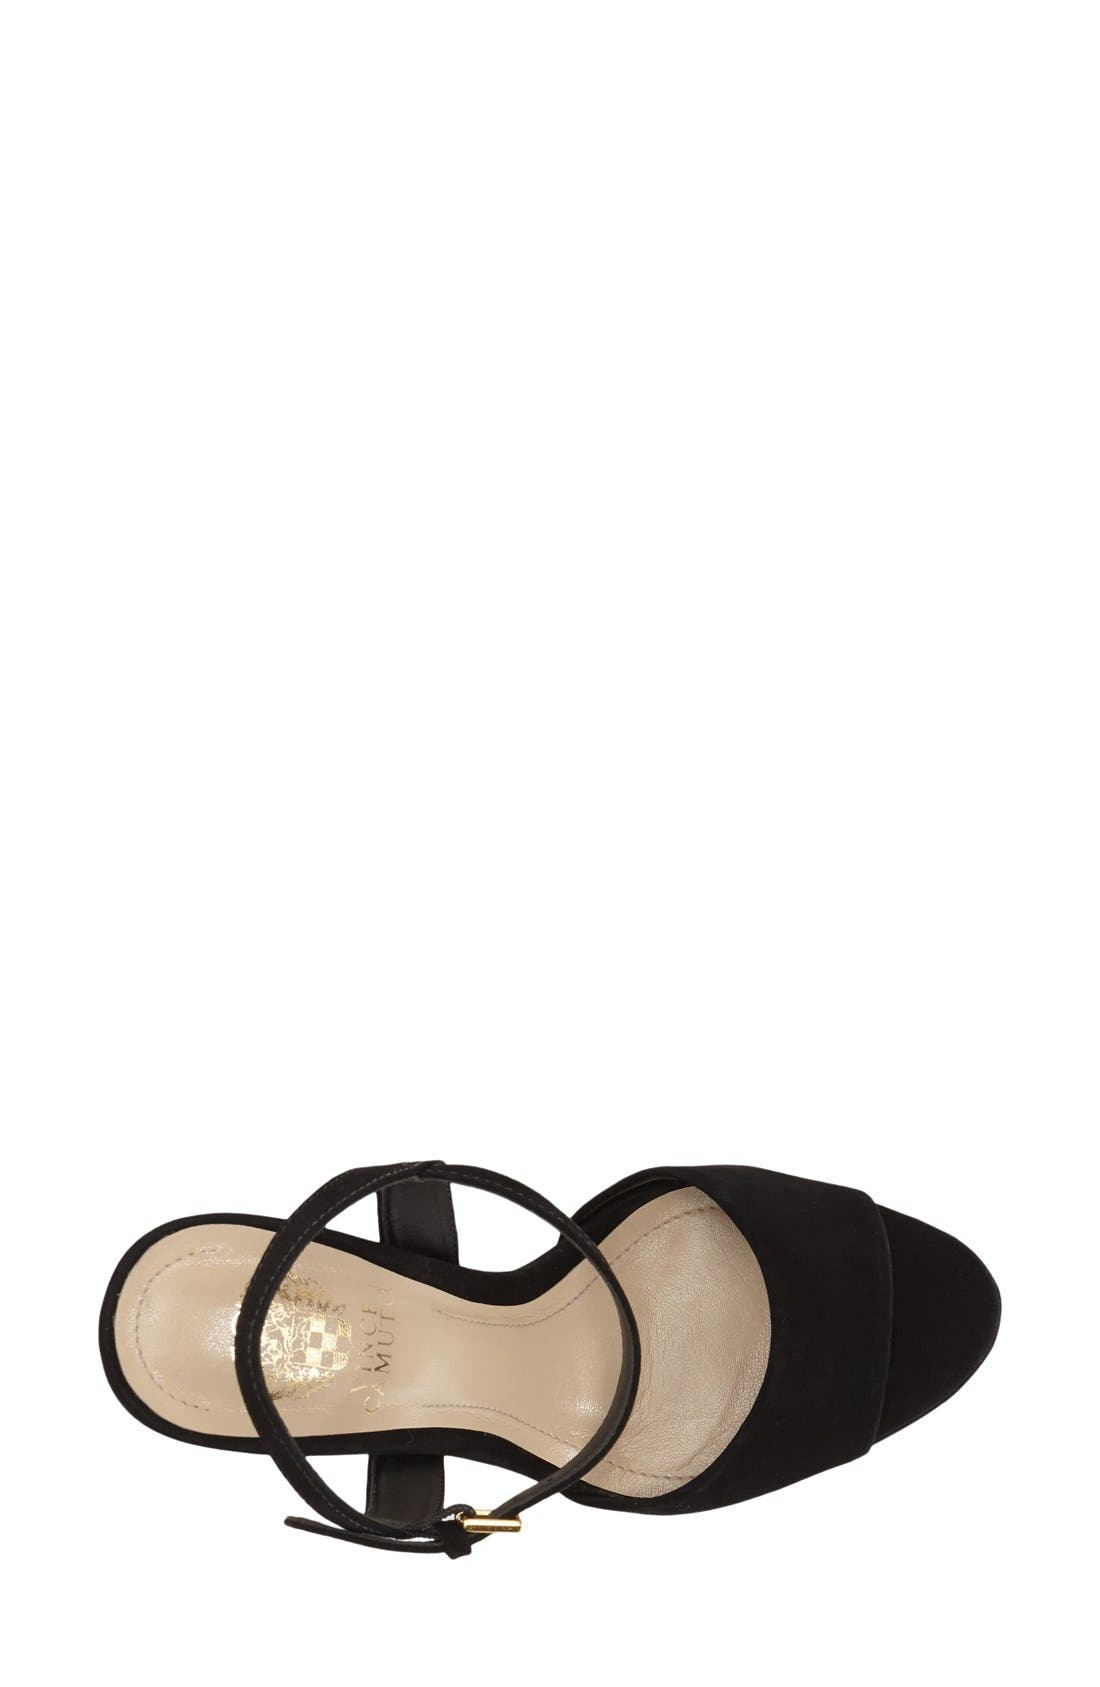 Alternate Image 3  - Vince Camuto 'Krysta' Platform Sandal (Women)